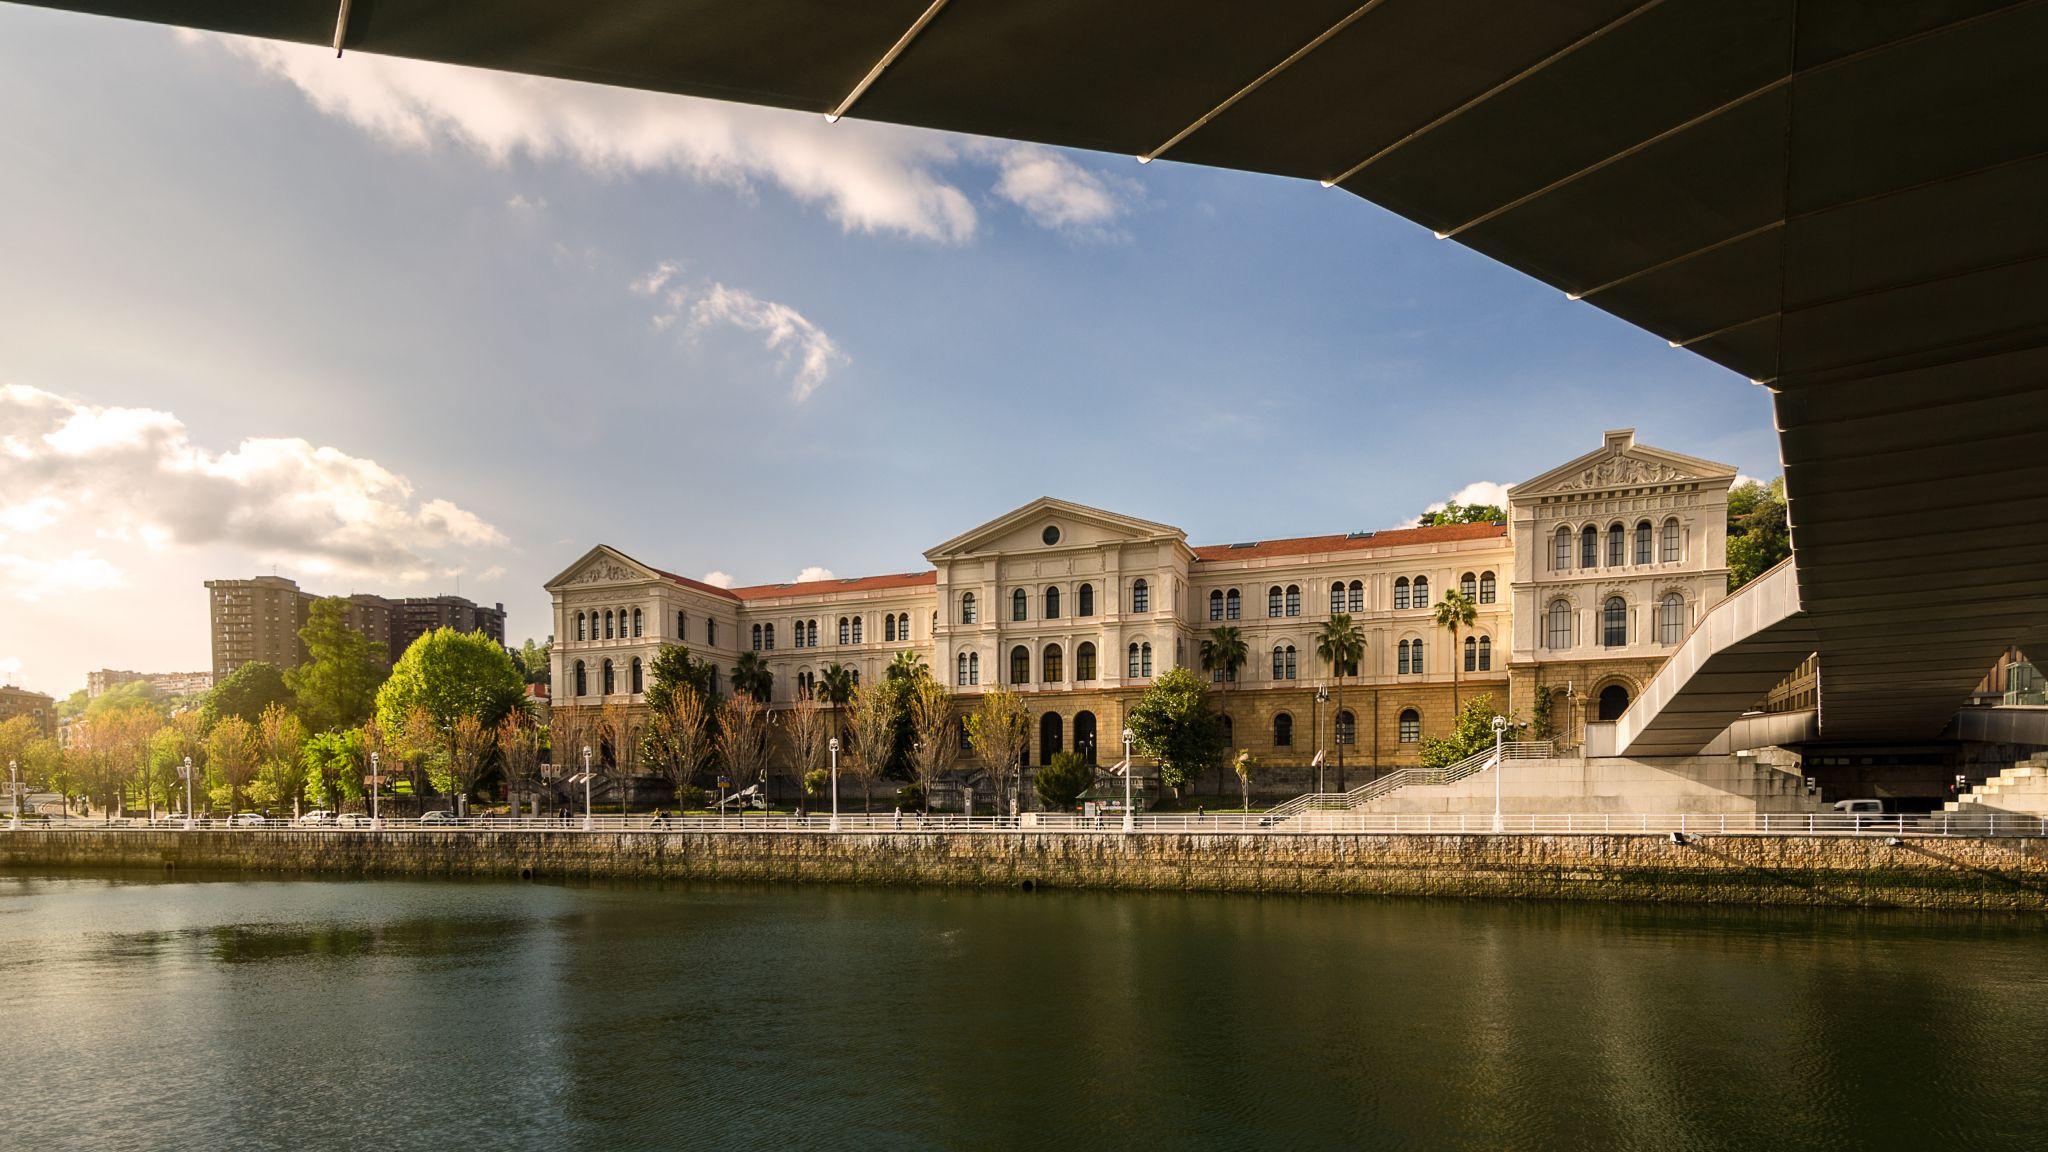 University of Deusto, Spain